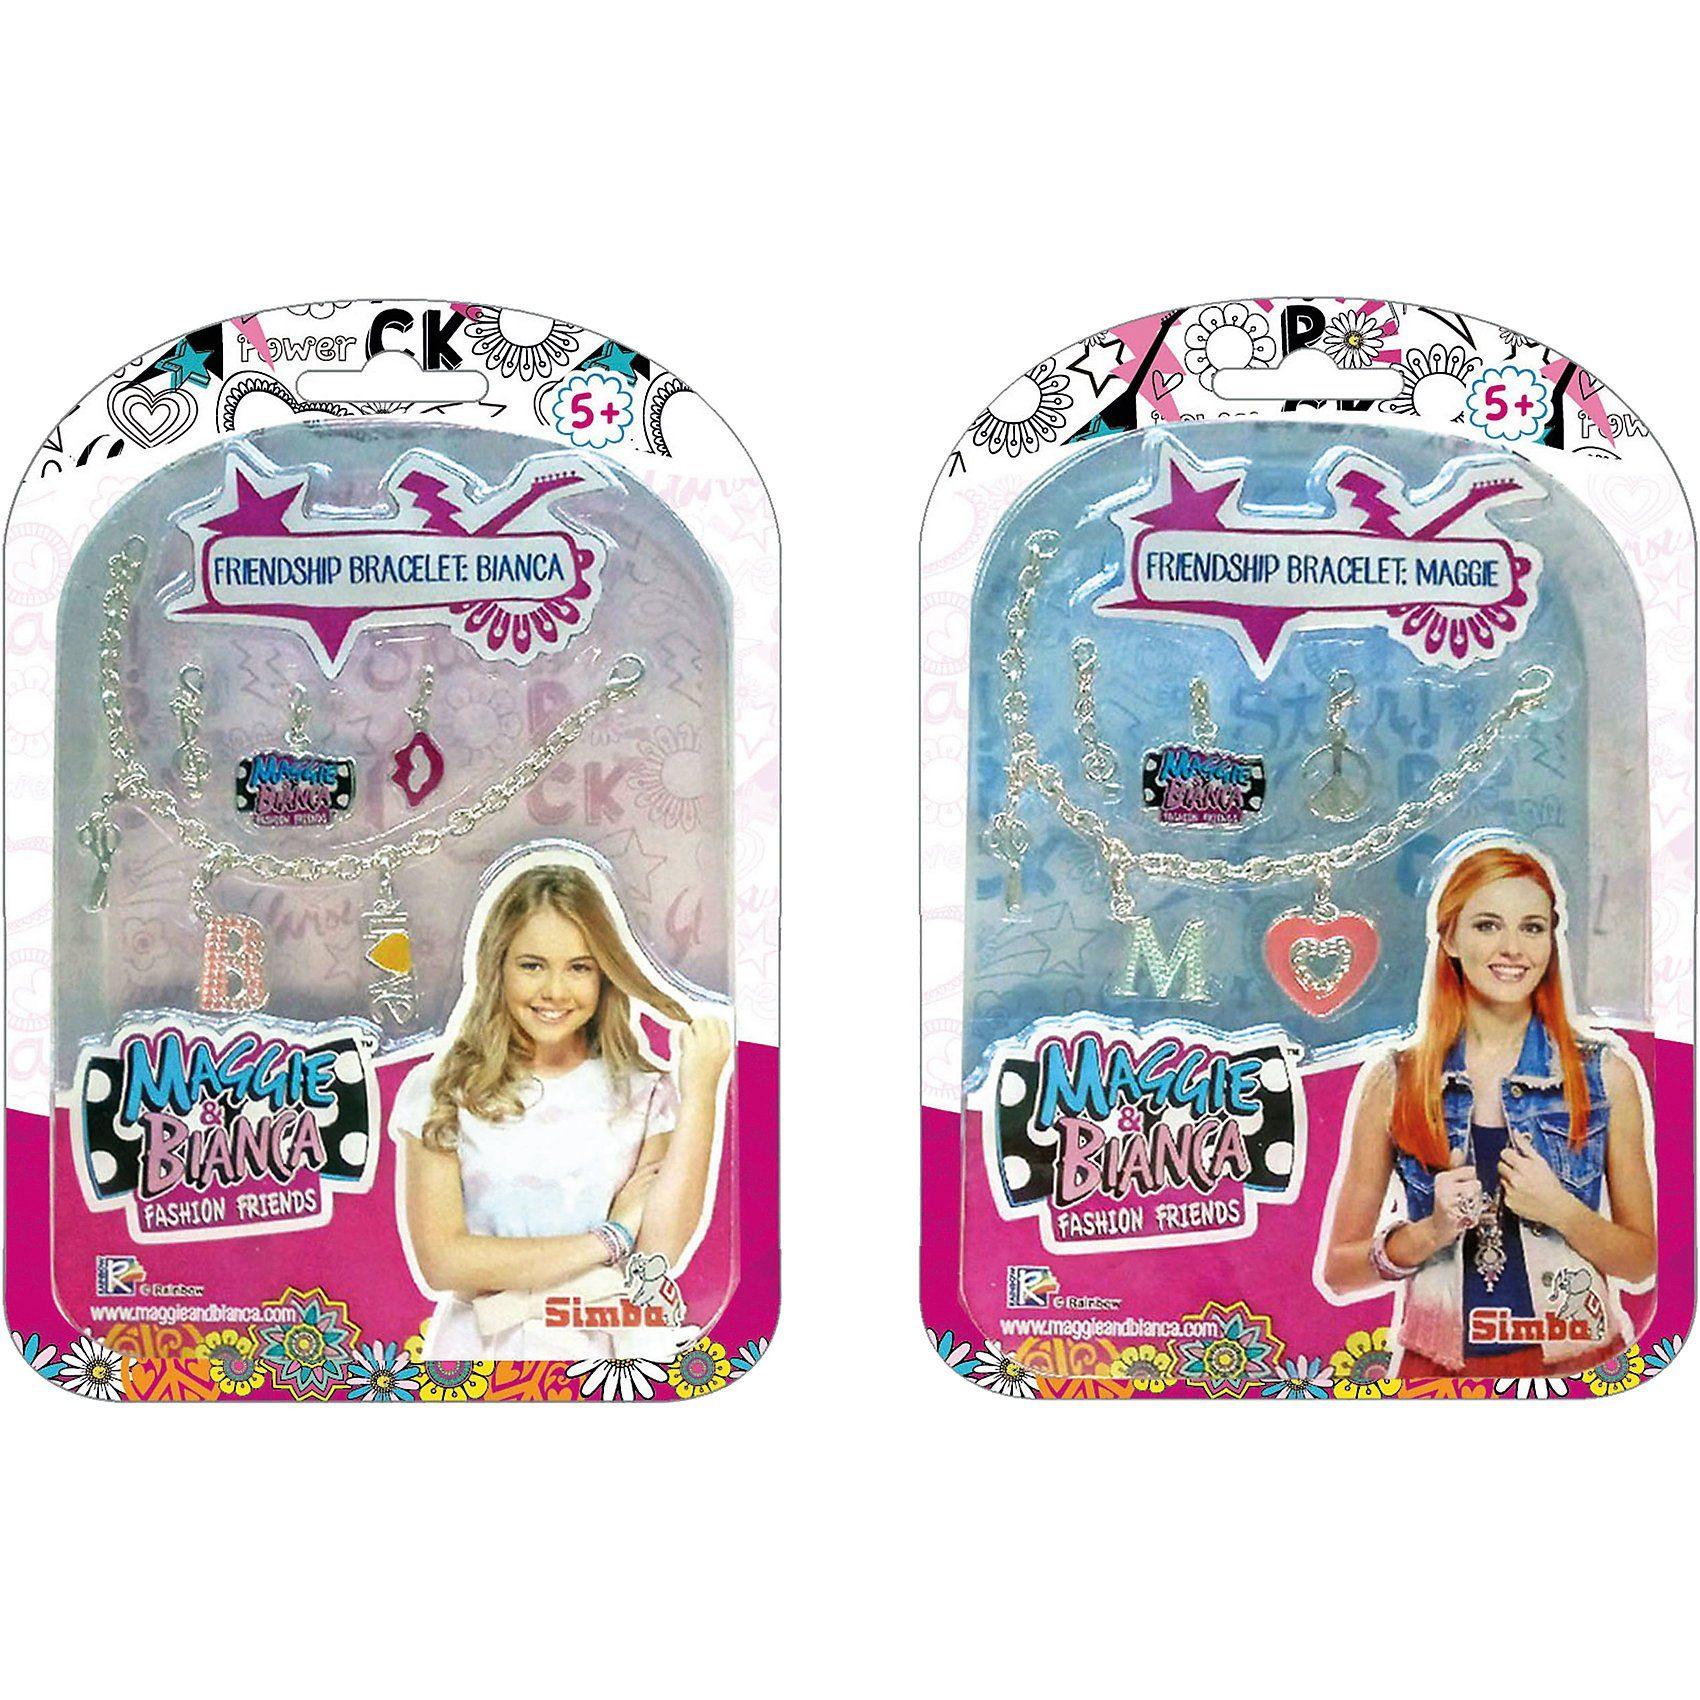 Simba Maggie & Bianca Fashion Friends Freundschafts- armband, 2-so